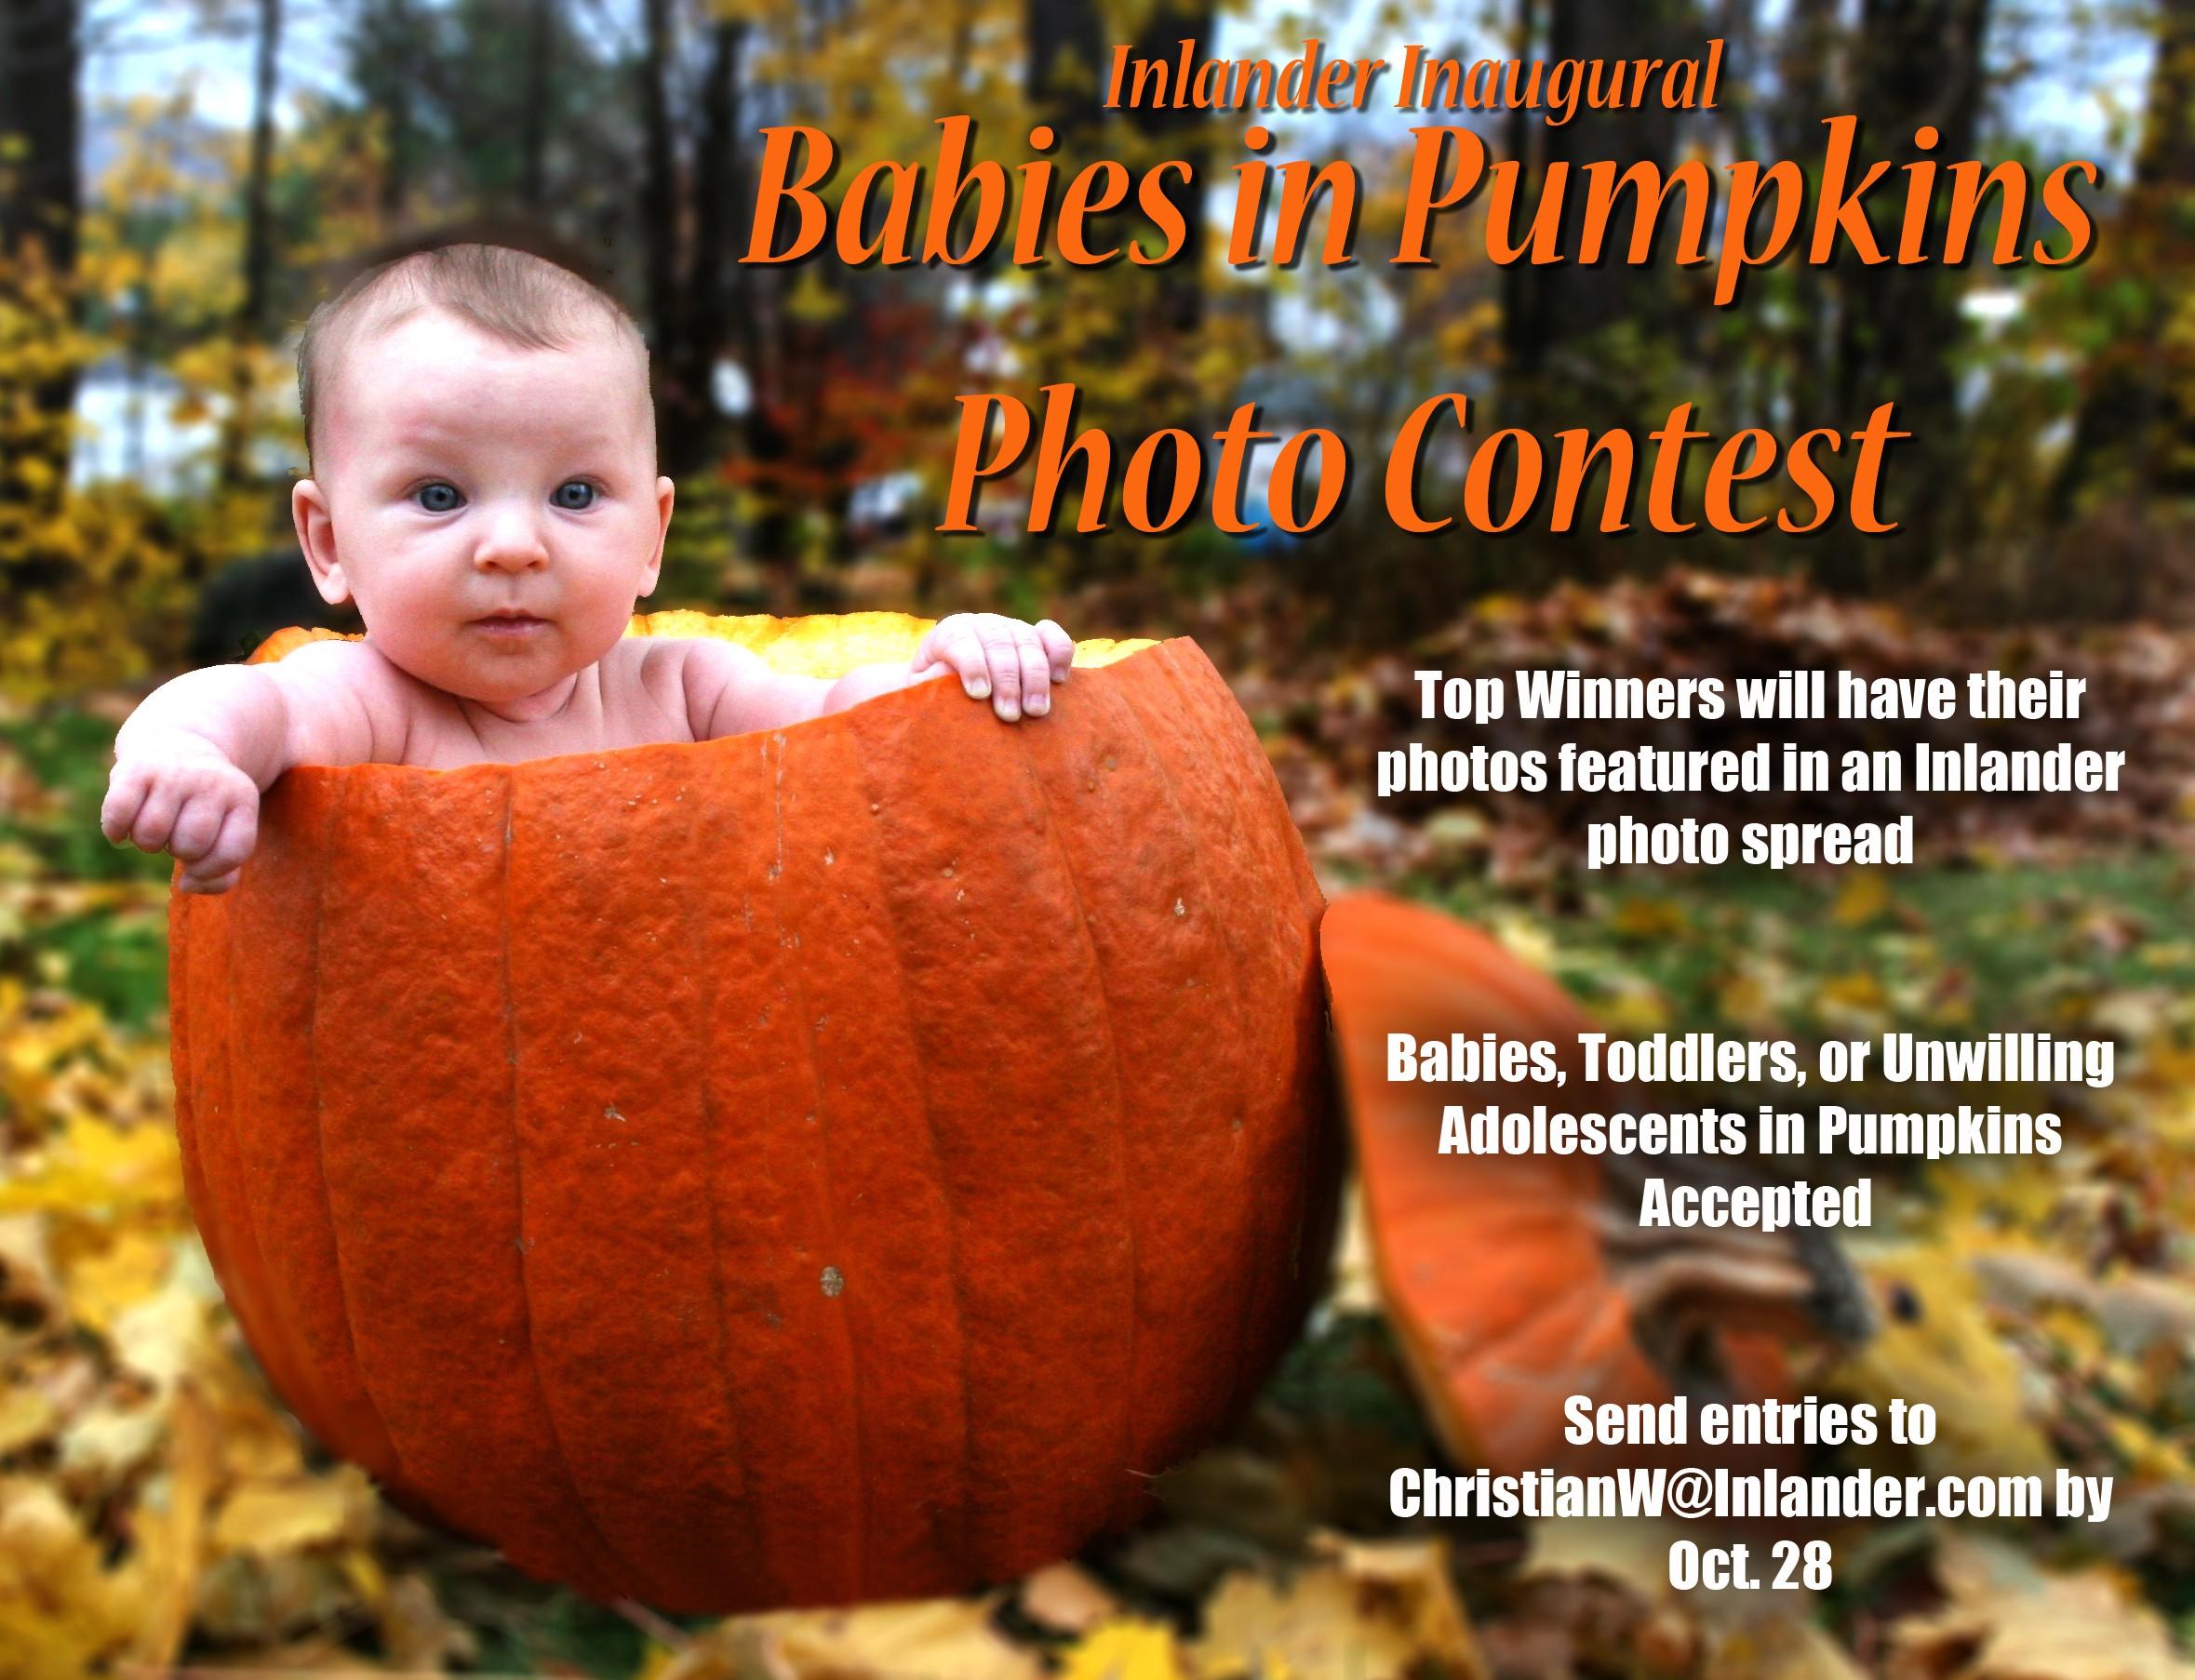 pumpkin_babies_photo_contest.jpg